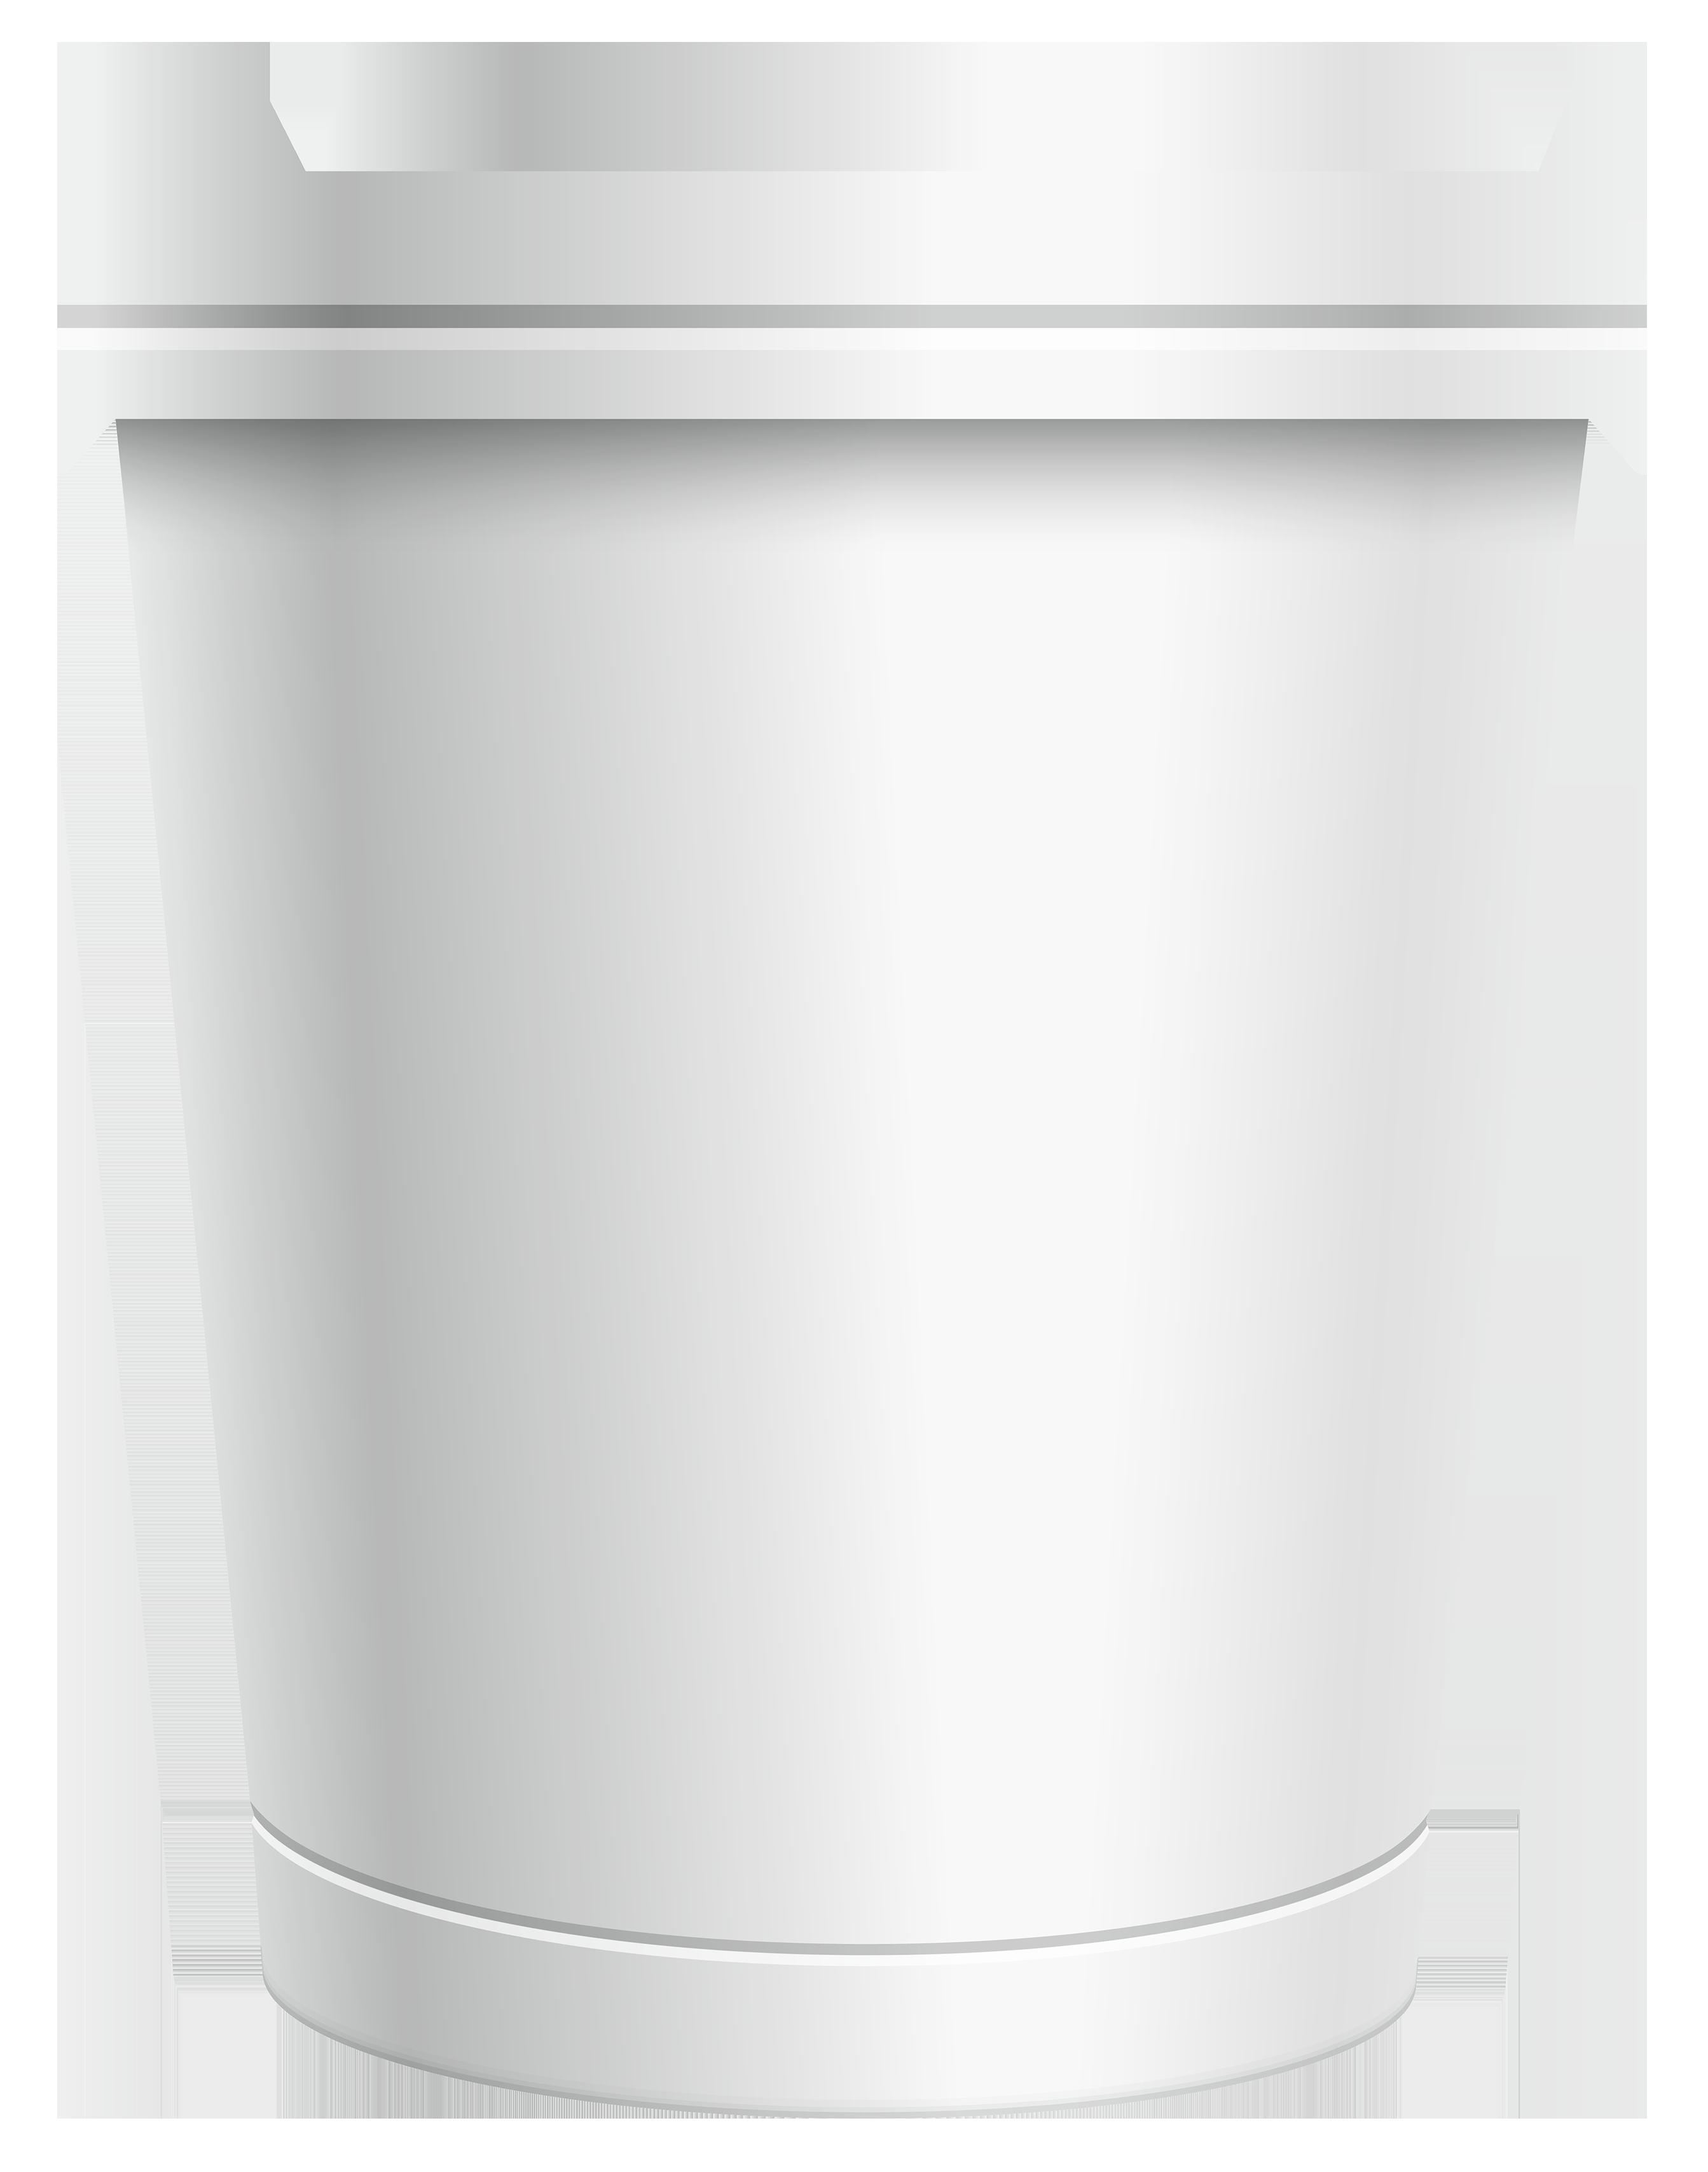 Mug clipart plastic mug. White coffee cup png